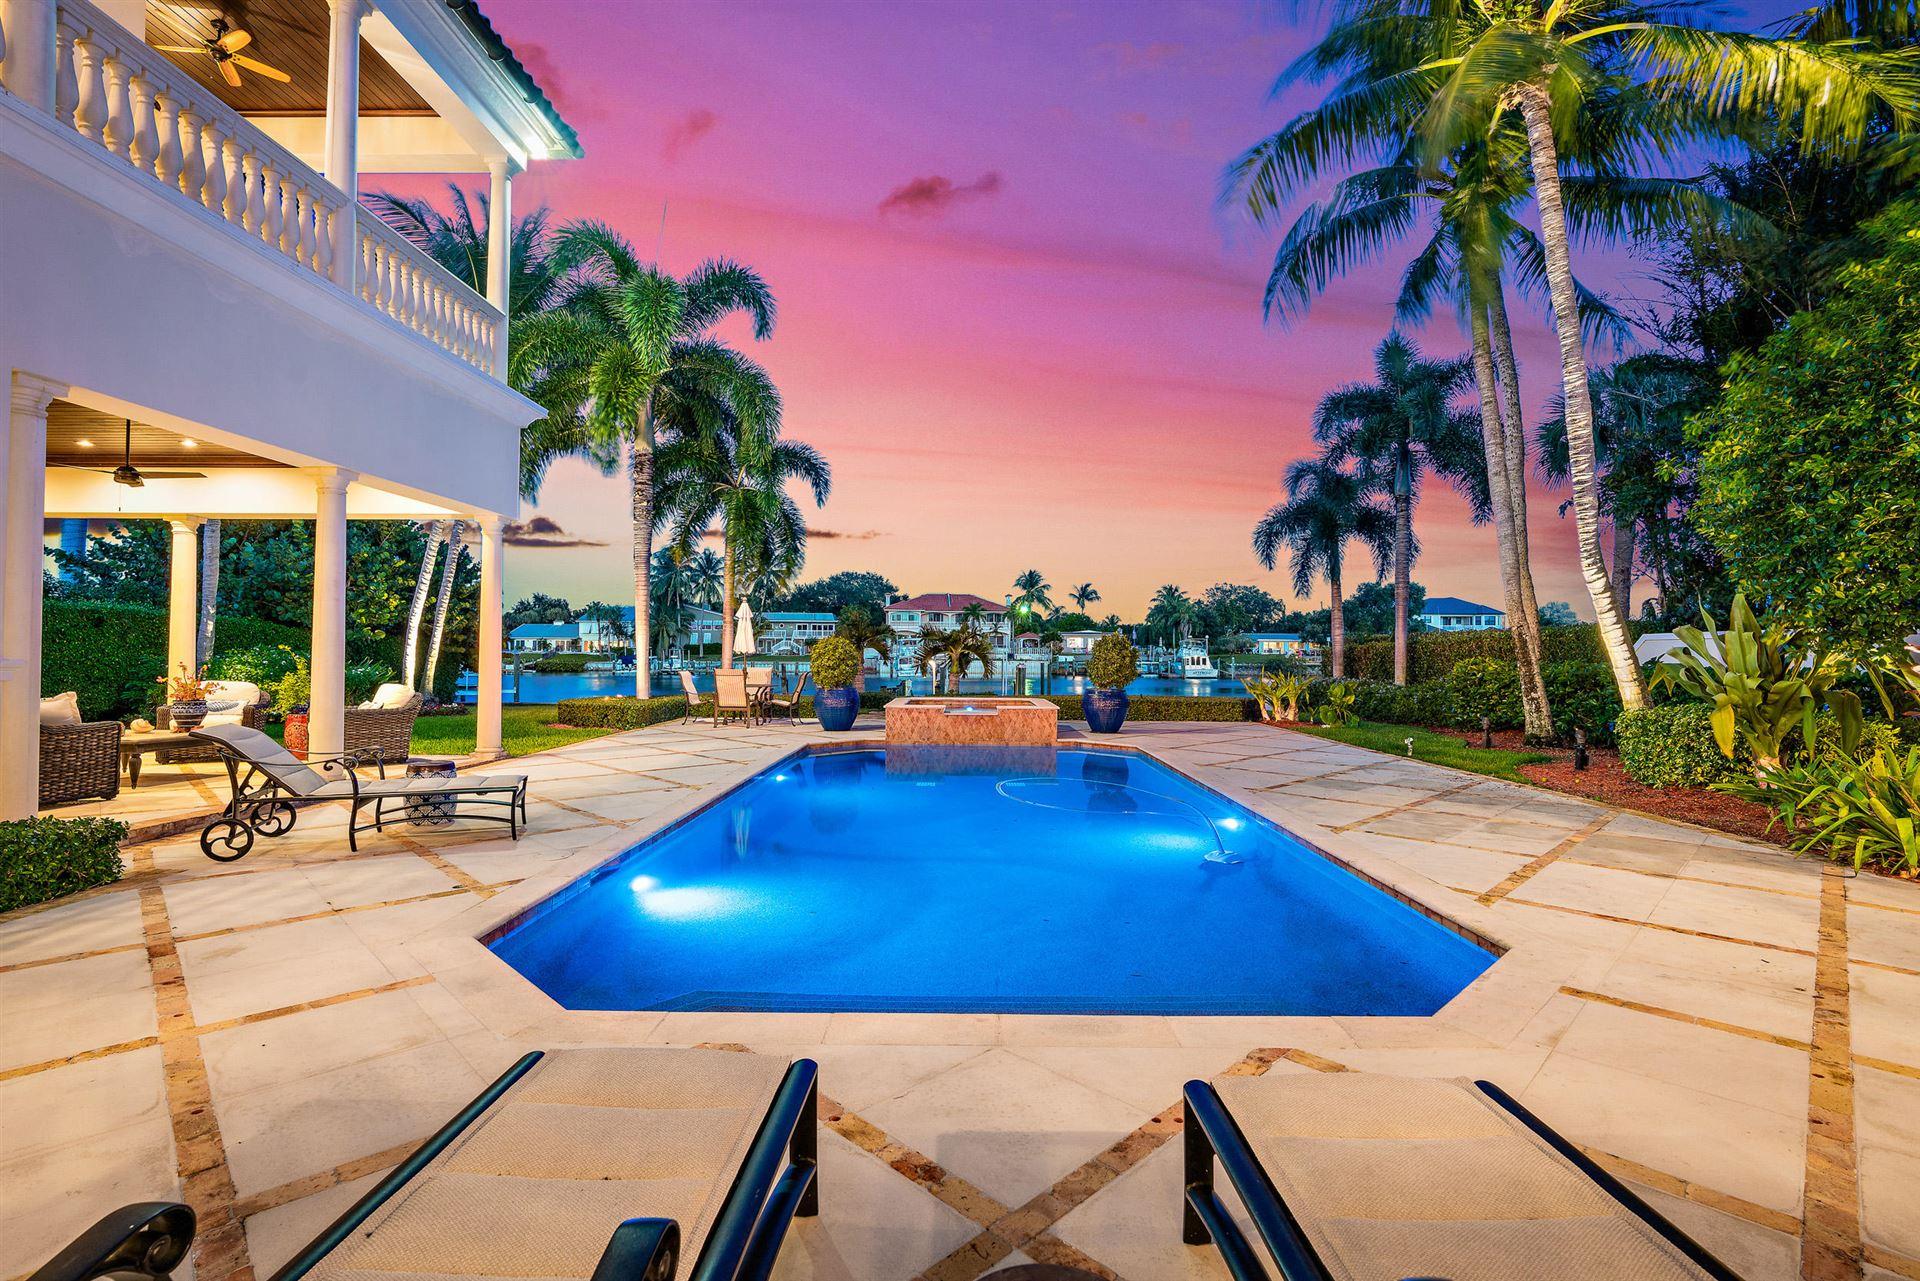 11952 S Edgewater Drive, Palm Beach Gardens, FL 33410 - #: RX-10638583